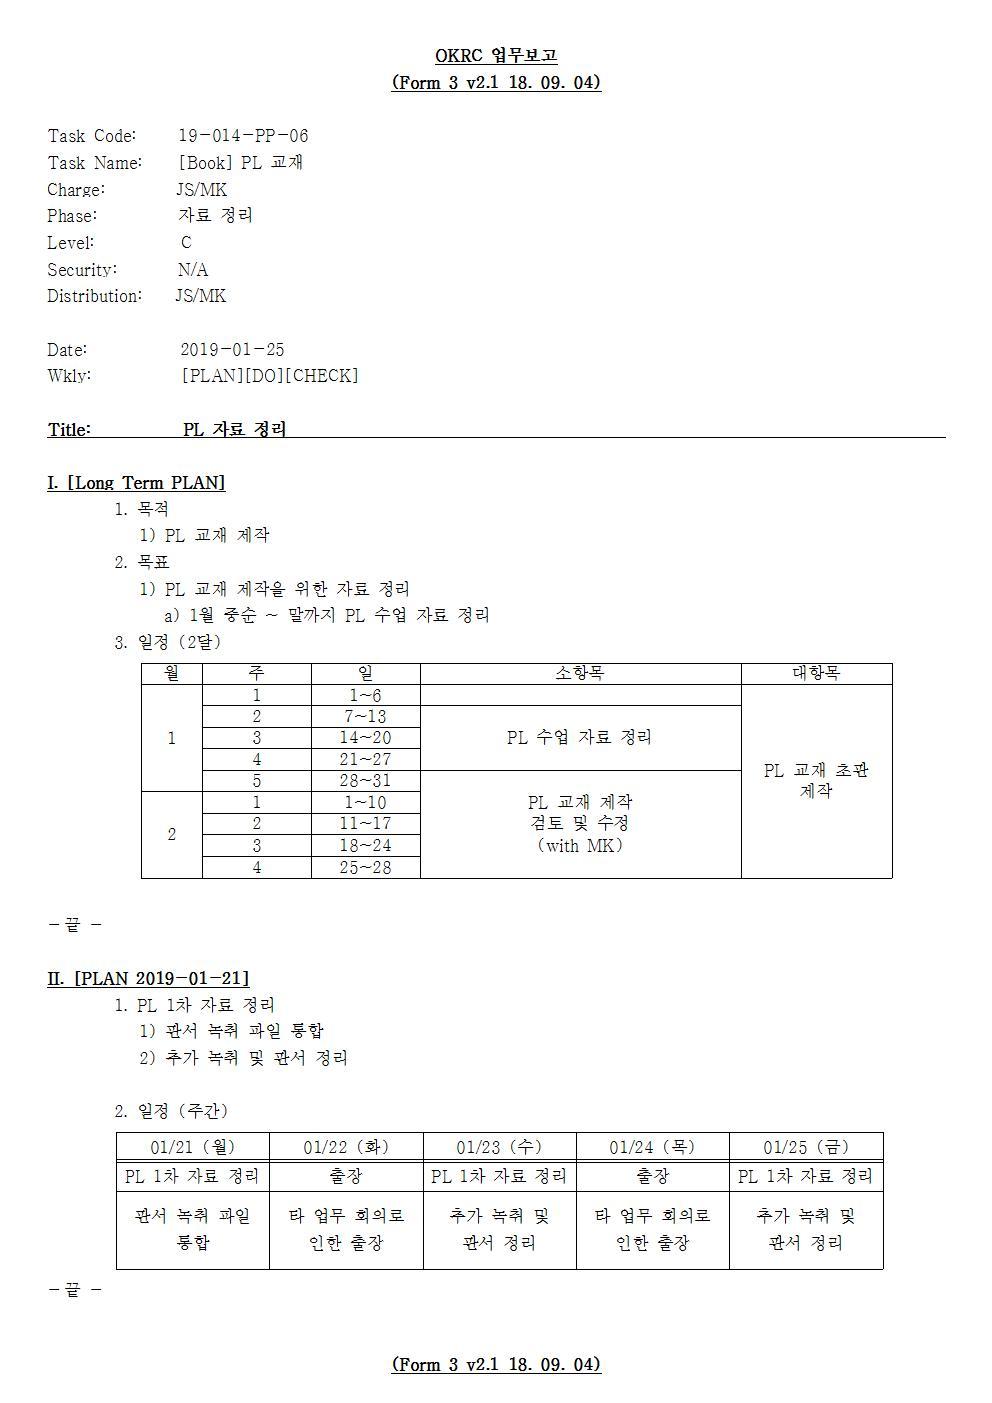 D-[19-014-PP-06]-[Book-PL]-[2019-01-25][JS]001.jpg